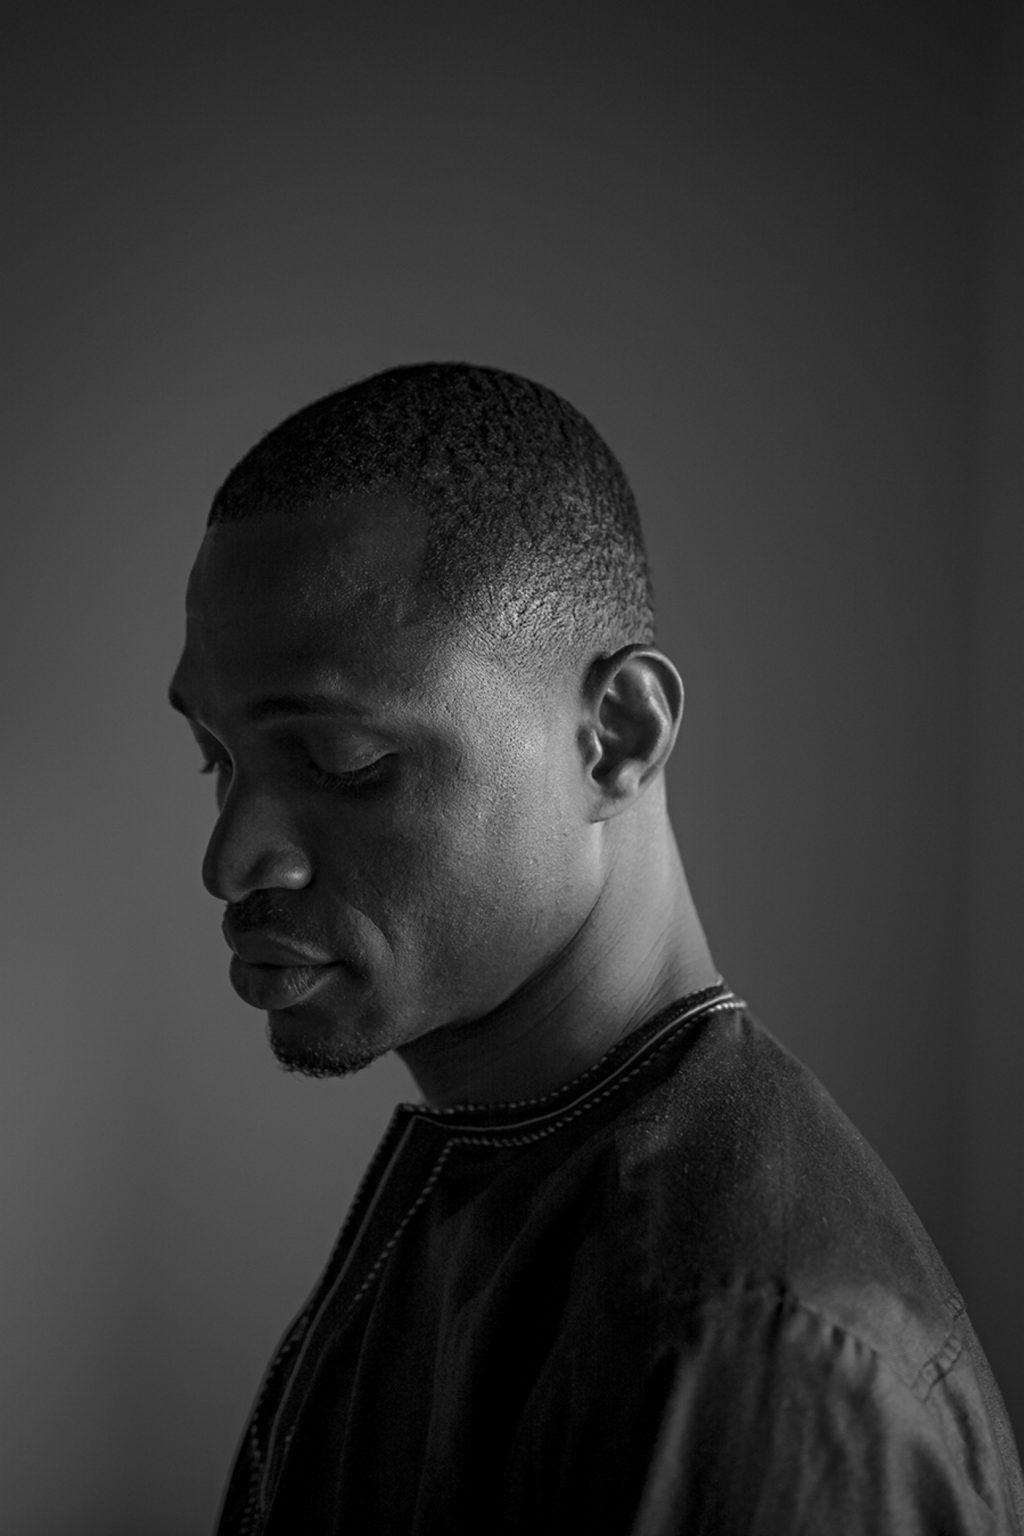 Portrait of Yacuba Camate, born in 1996 in Ivory Coast. Reggio Emilia, Italy, 2019